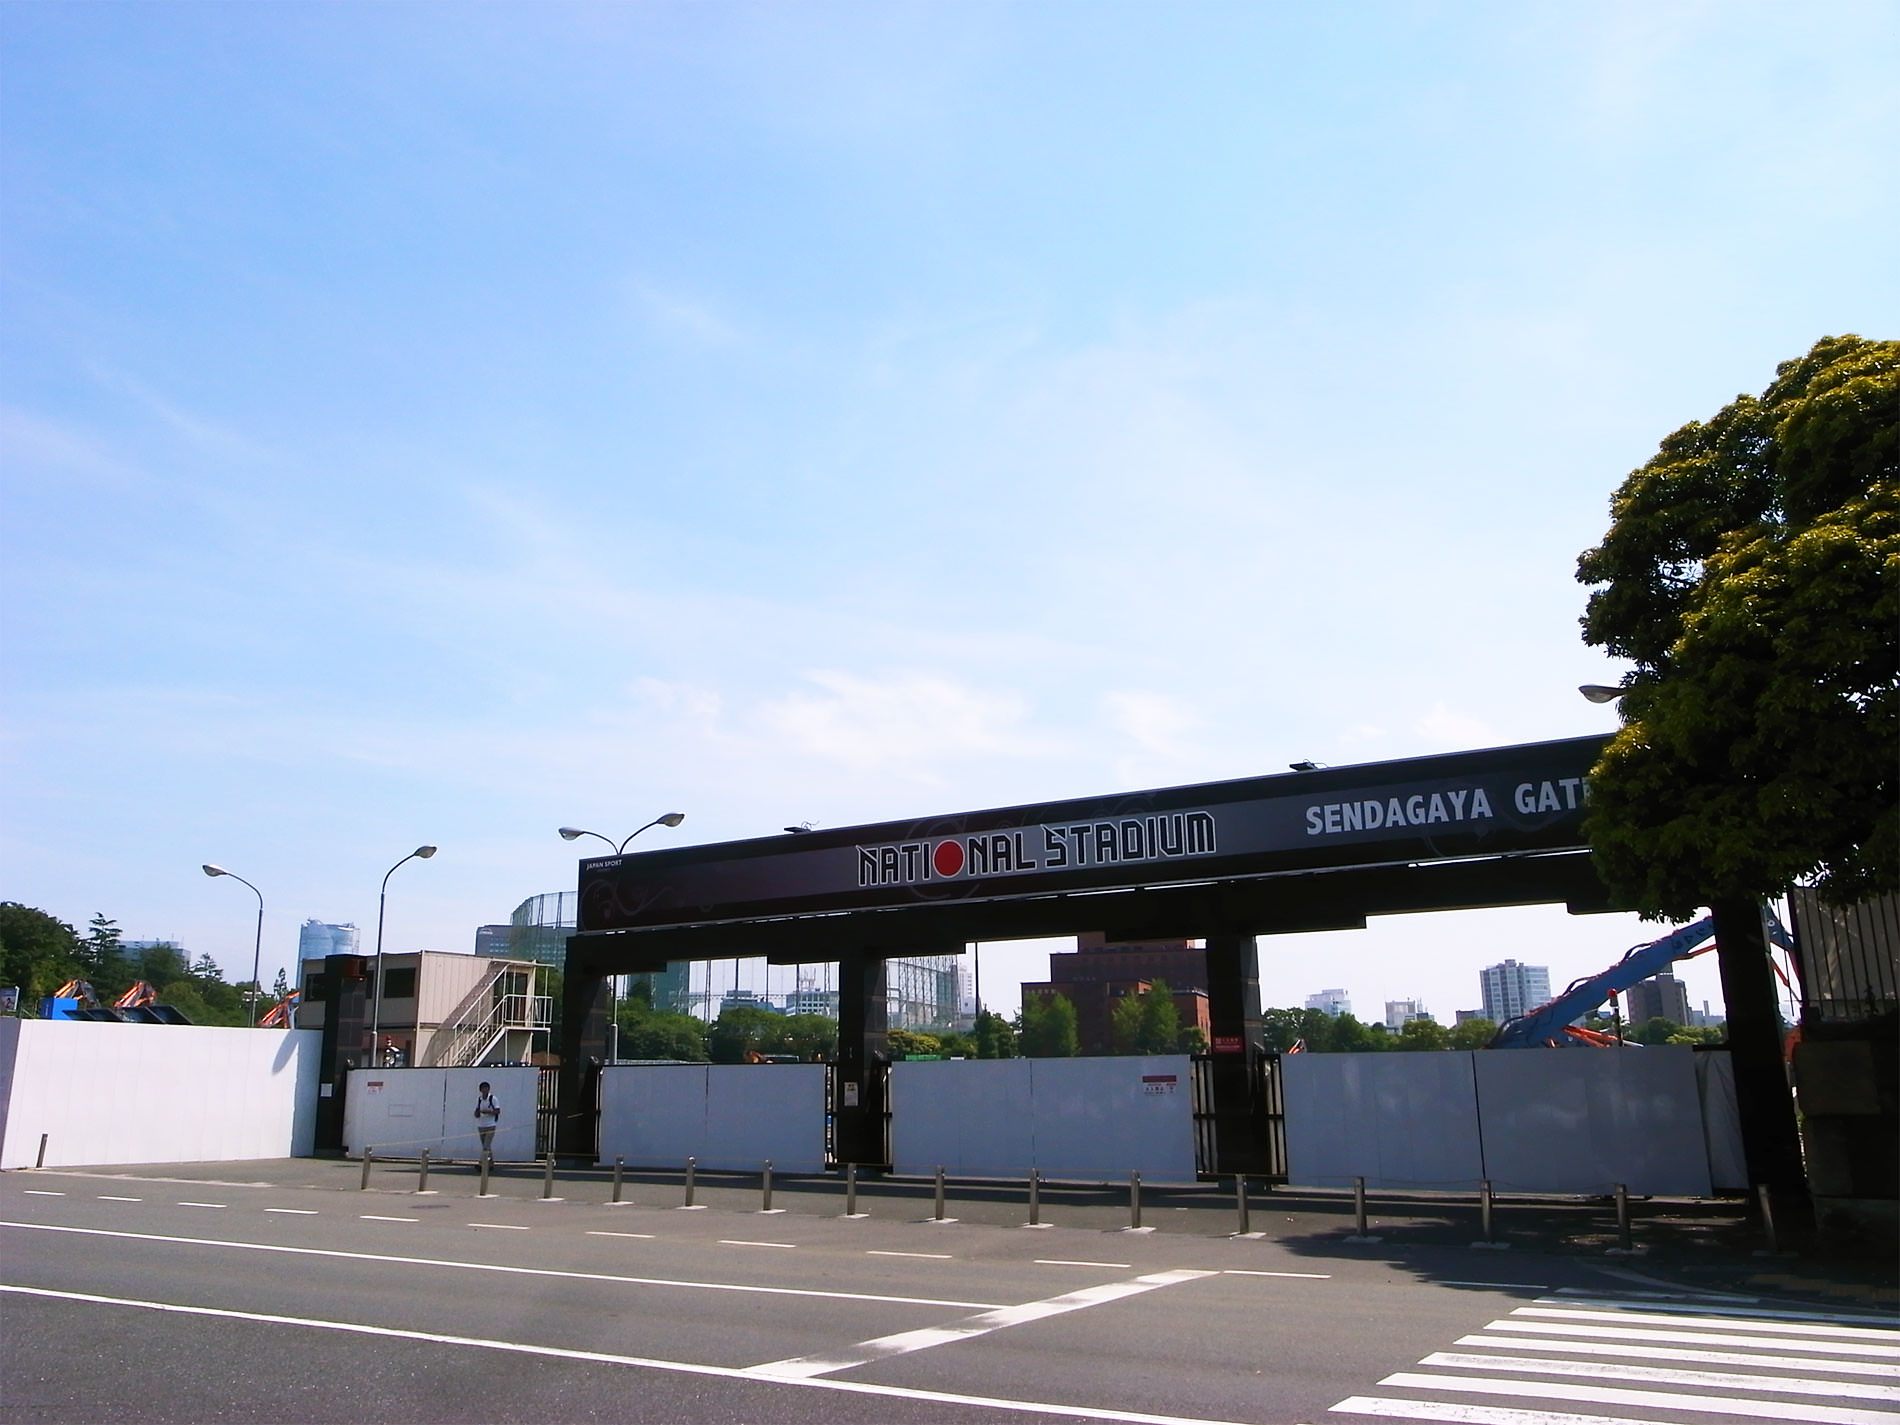 国立競技場 跡地 | National Stadium Tokyo May, 2015